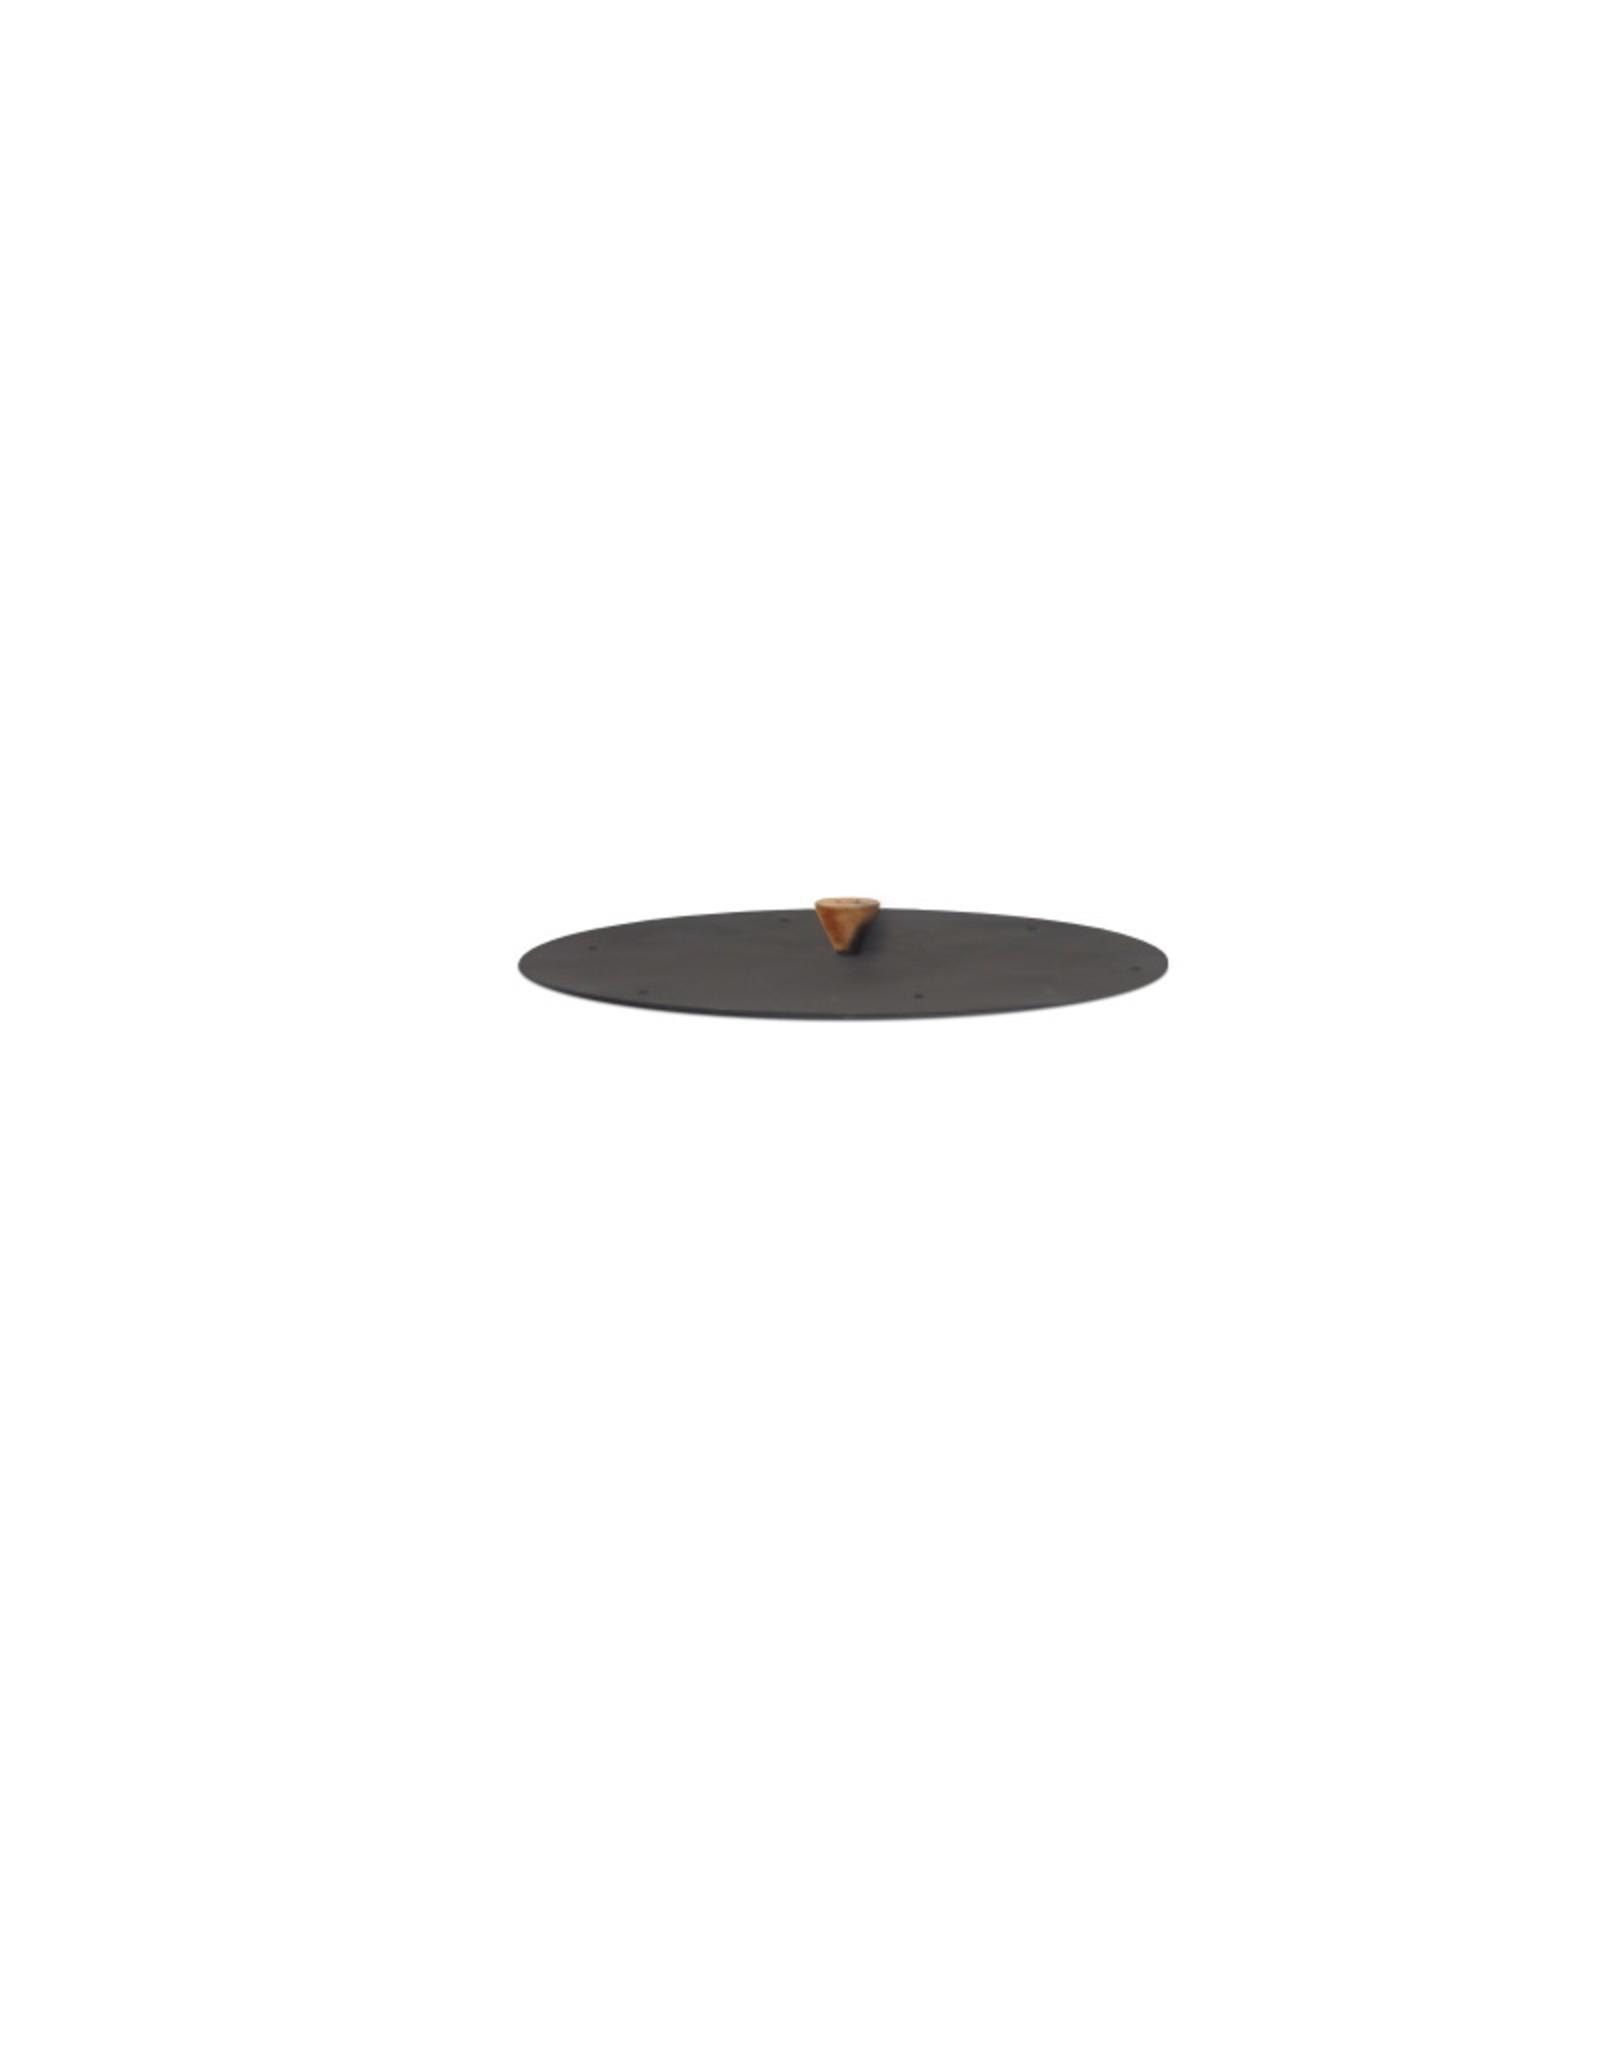 OFYR Doofdeksel Zwart en Afdekhoes Zwart Set 100